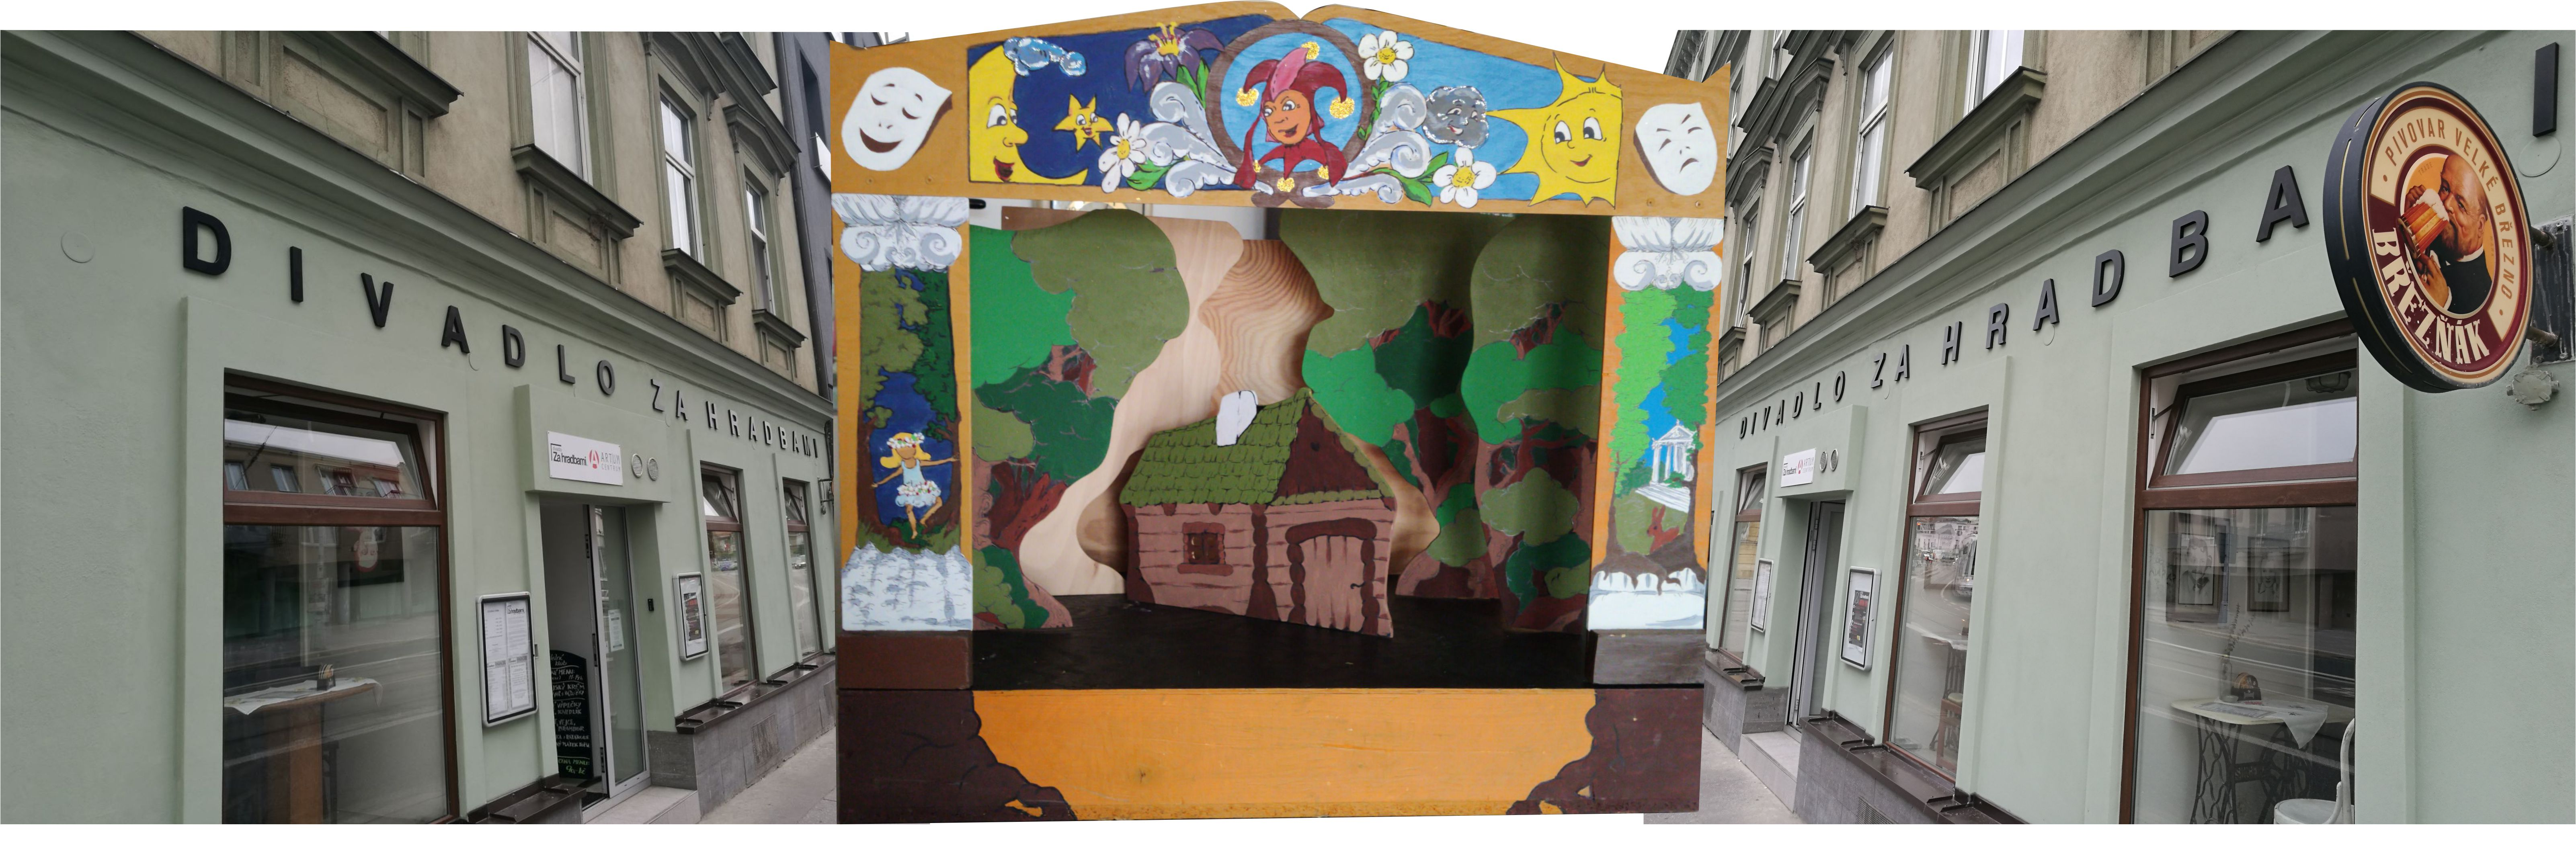 Divadelní klub - Divadlo Za hradbami